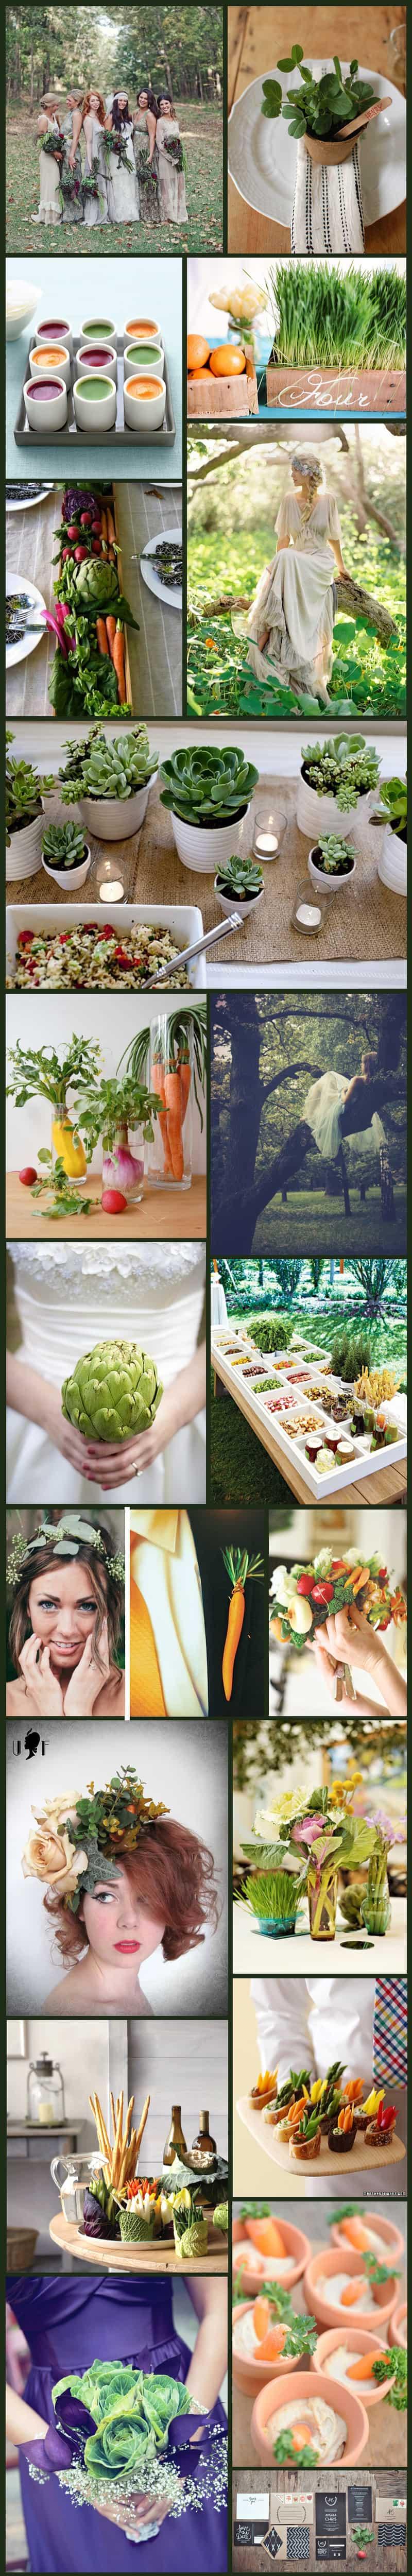 Earth Vegetable Garden Inspiration Board